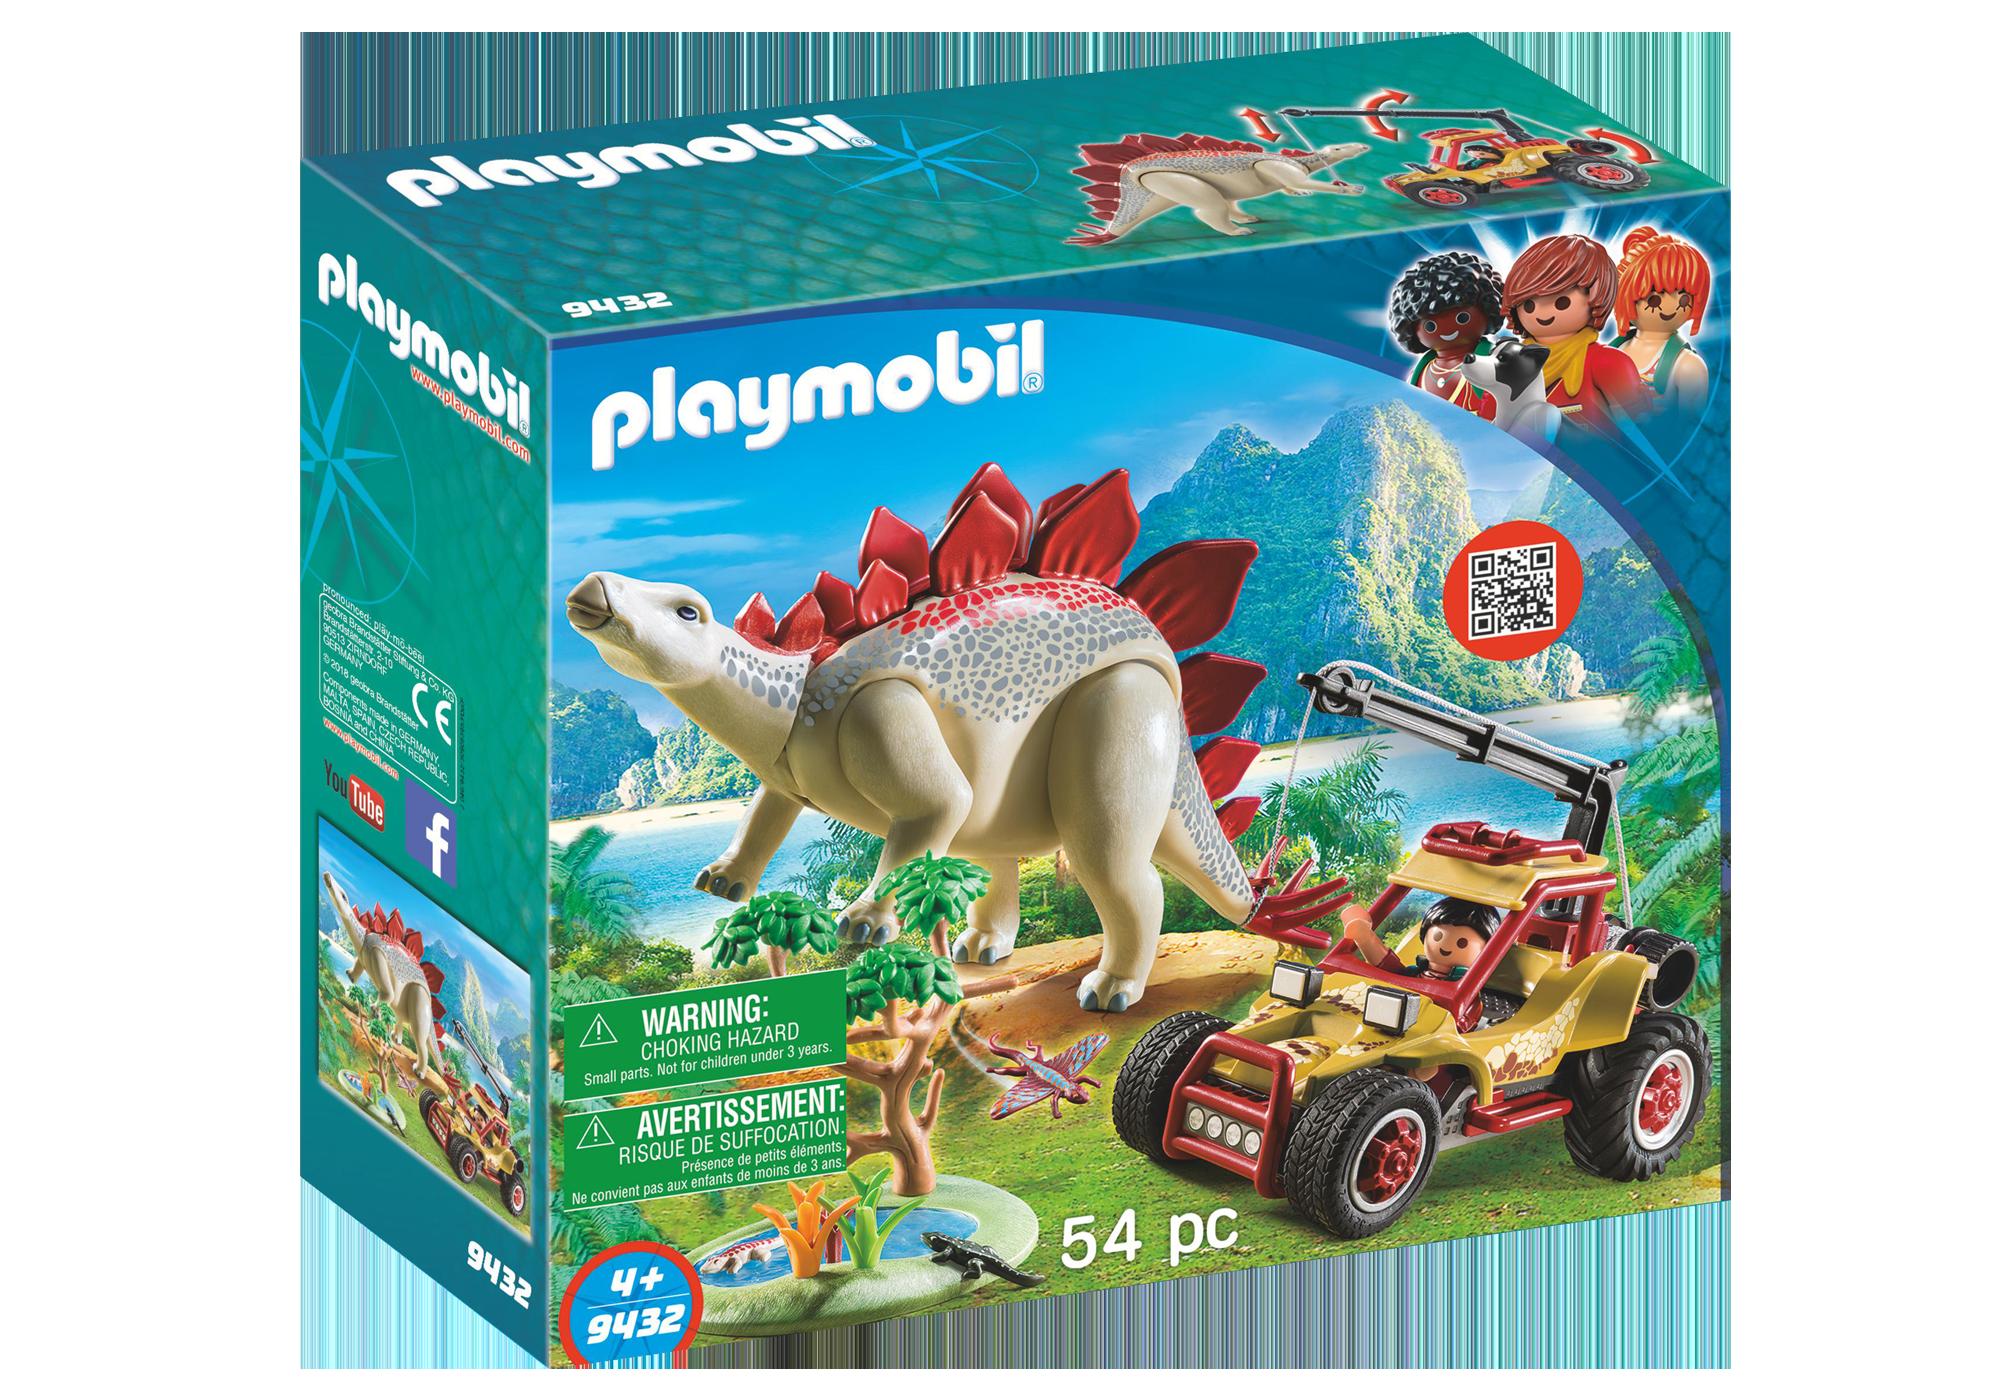 http://media.playmobil.com/i/playmobil/9432_product_box_front